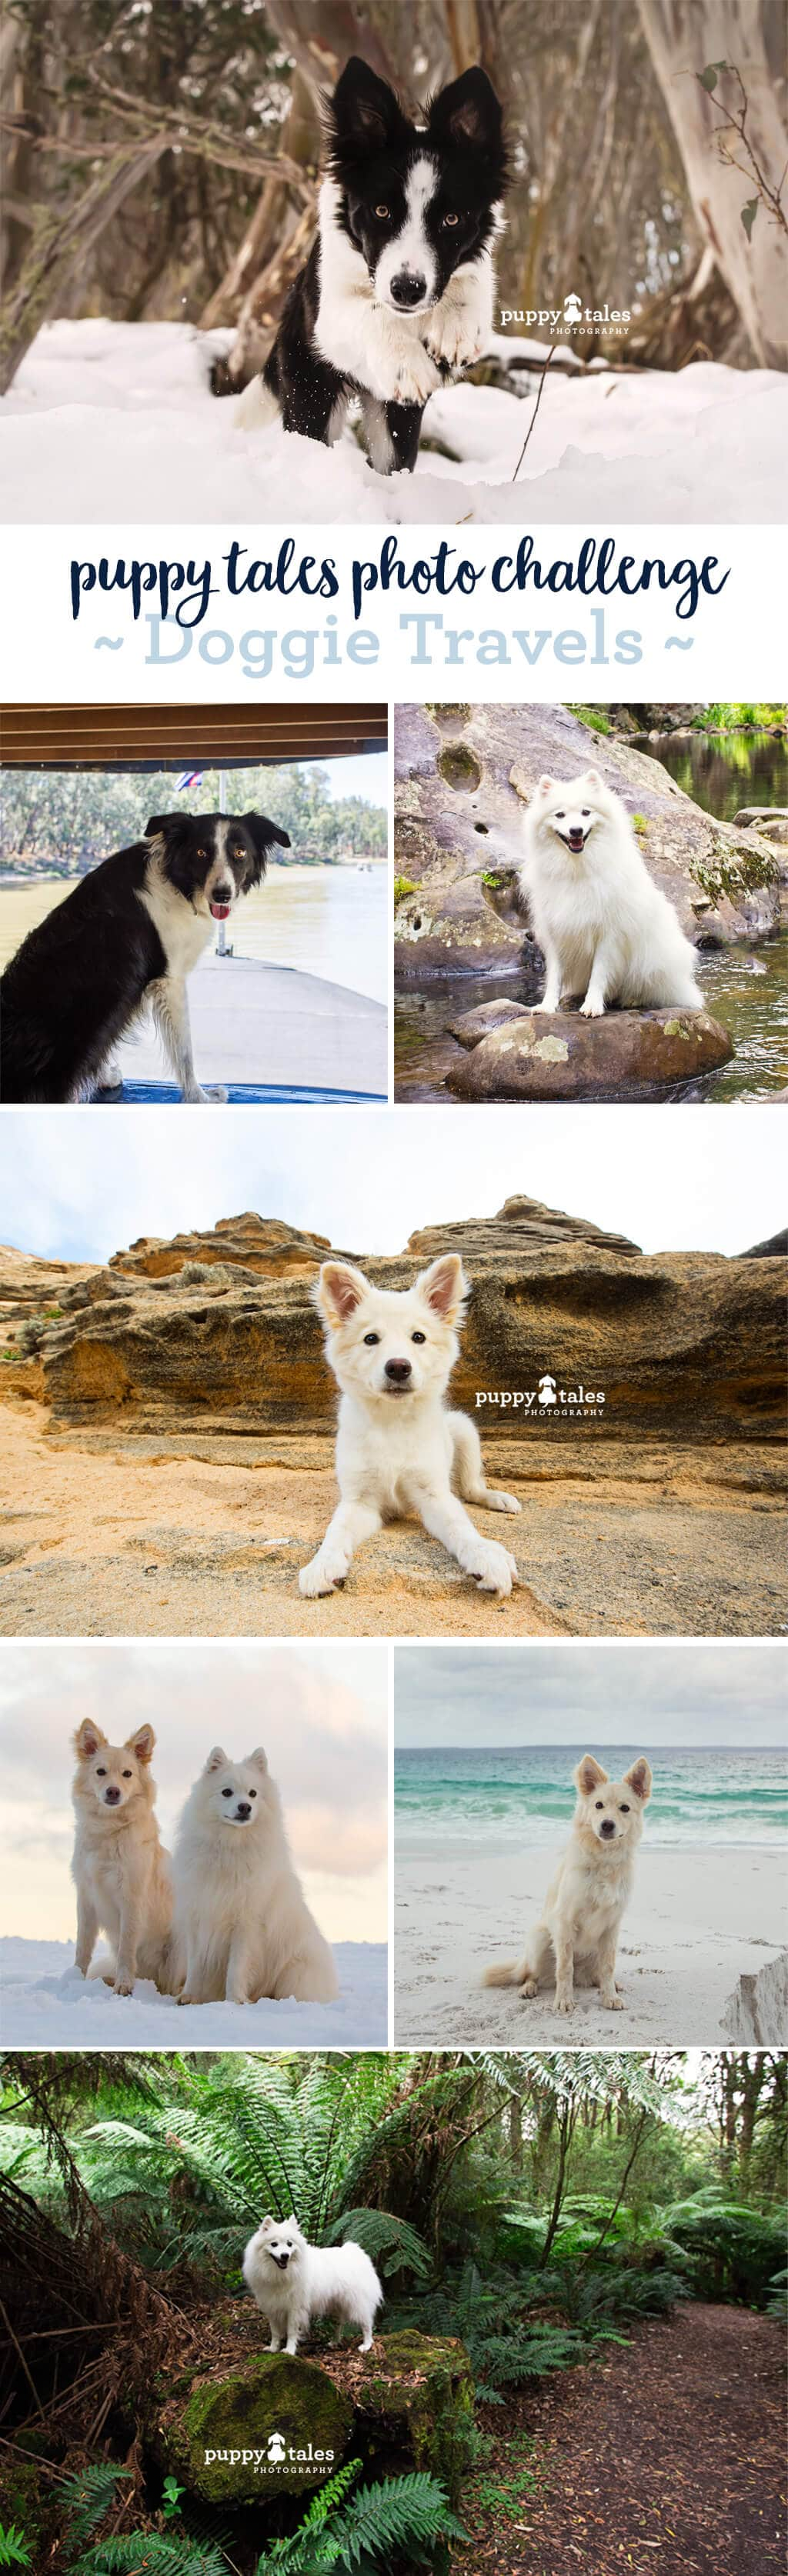 Puppy Tales Photo Challenge ~ Travel